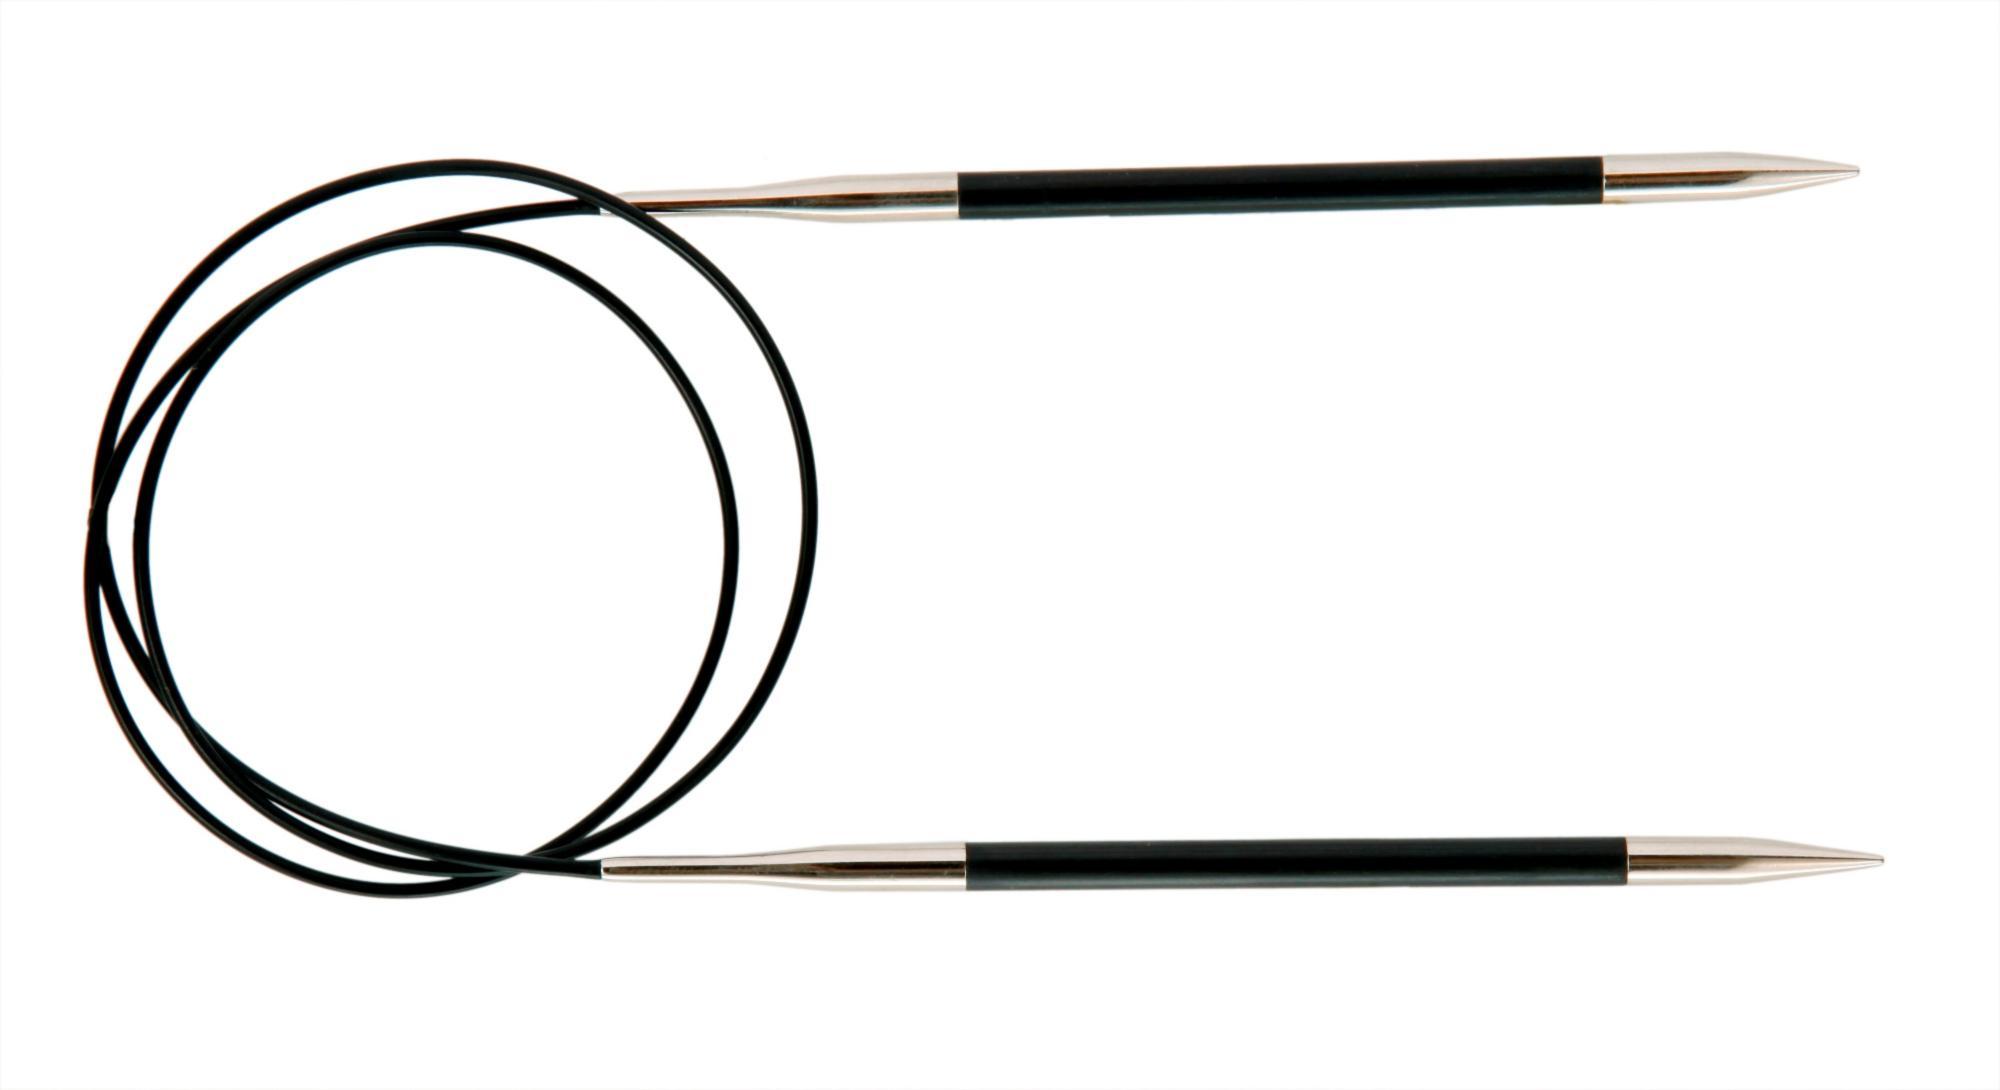 Спицы круговые 40 см Karbonz KnitPro, 41146, 3.50 мм